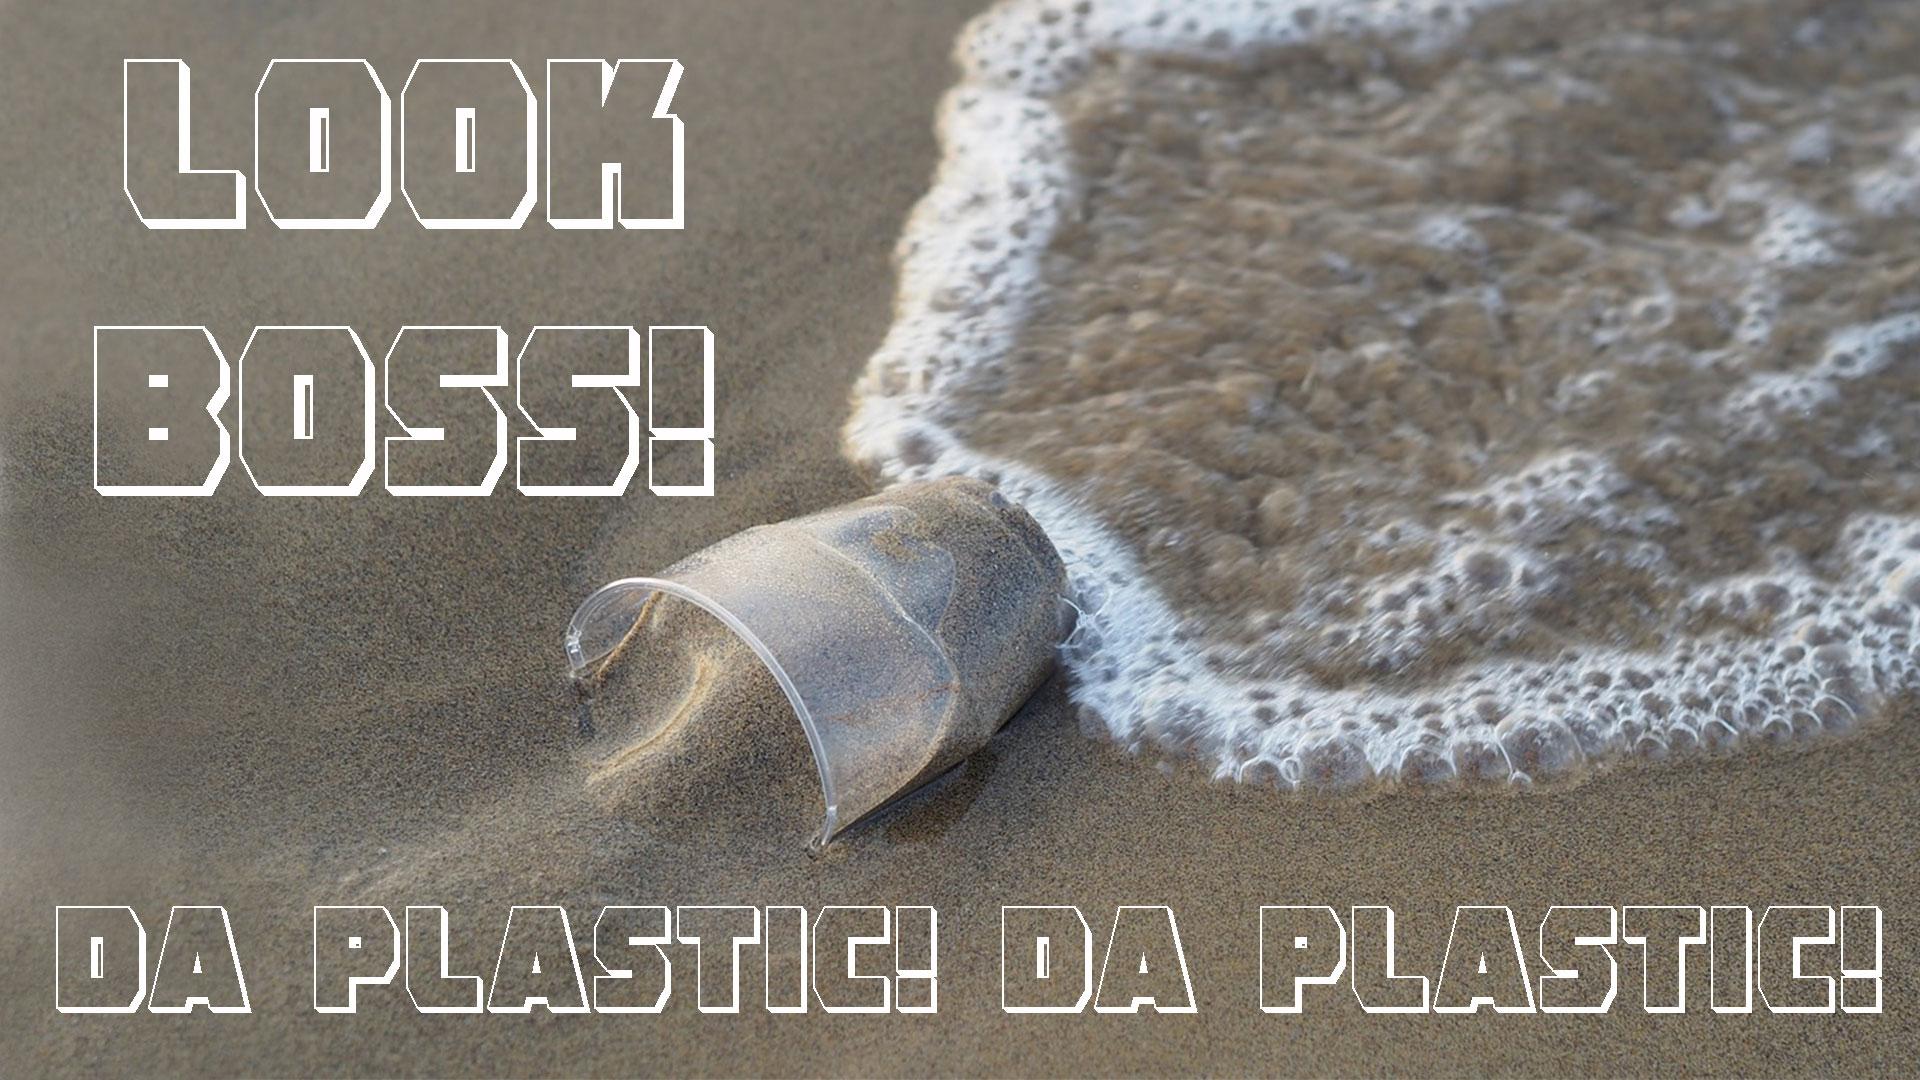 Ep. 104 - Look Boss - Da Plastic! Da Plastic!.jpg